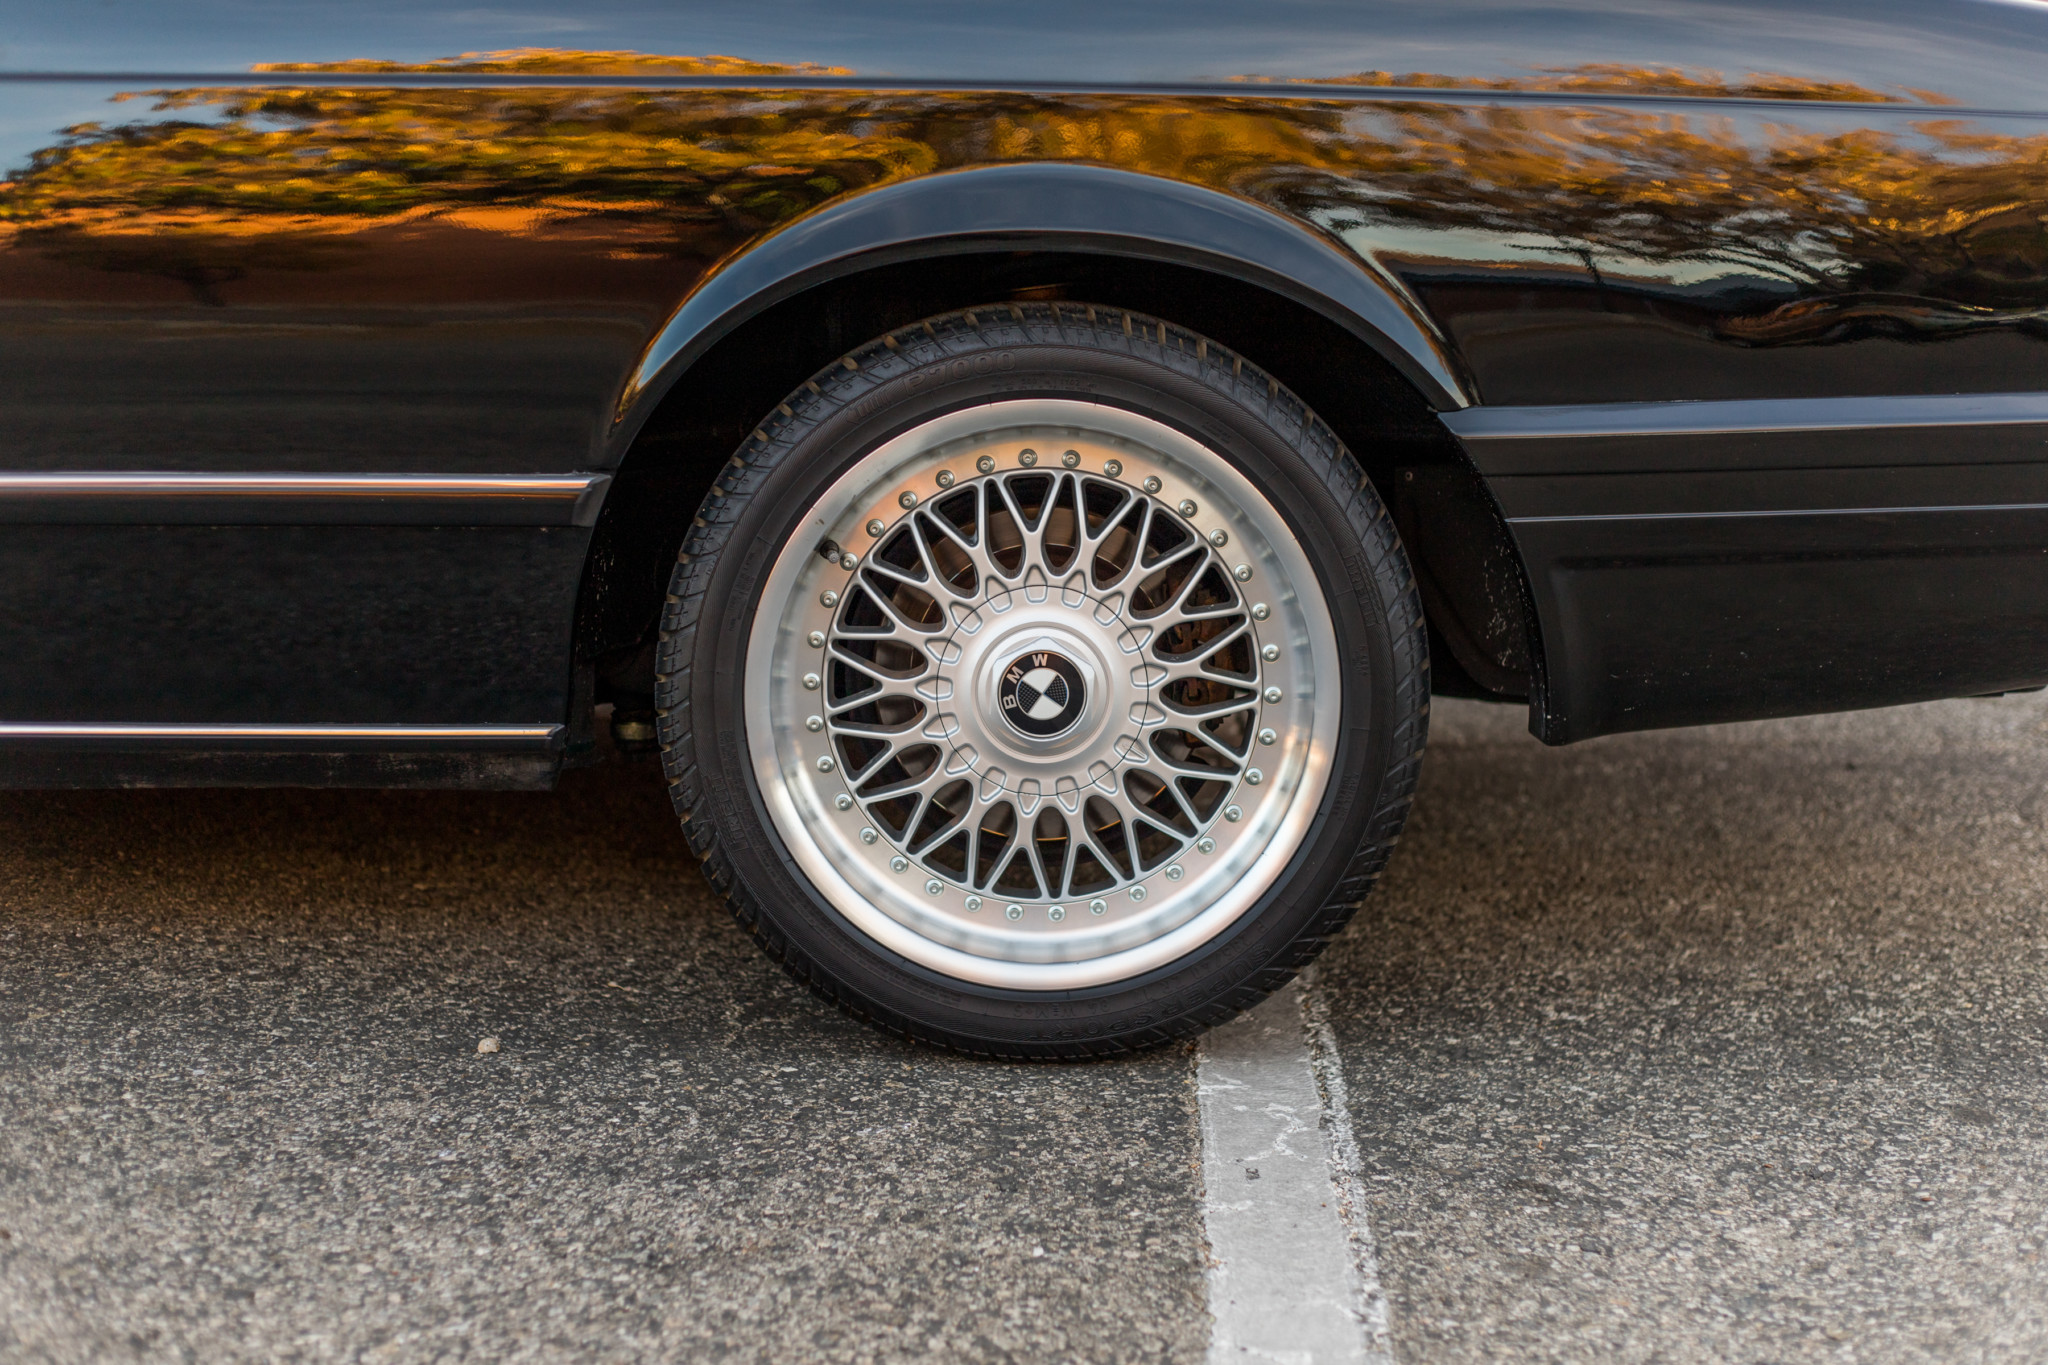 1988 bmw M6 kent classic cars (42).jpg